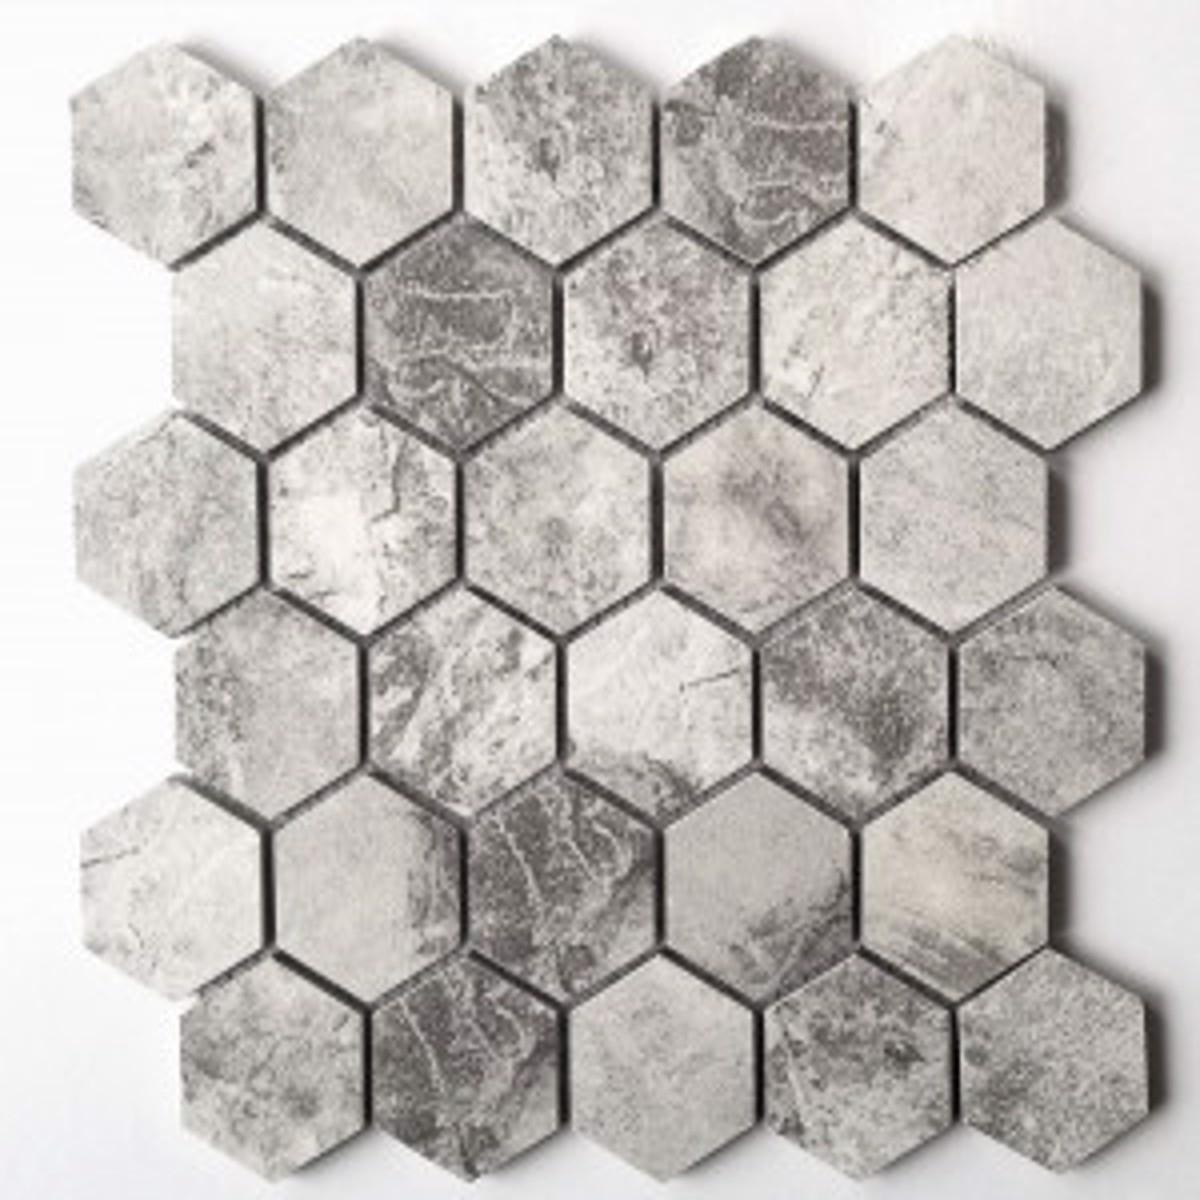 storm grey matte tru stone 2x2 hexagon mosaic porcelain tile